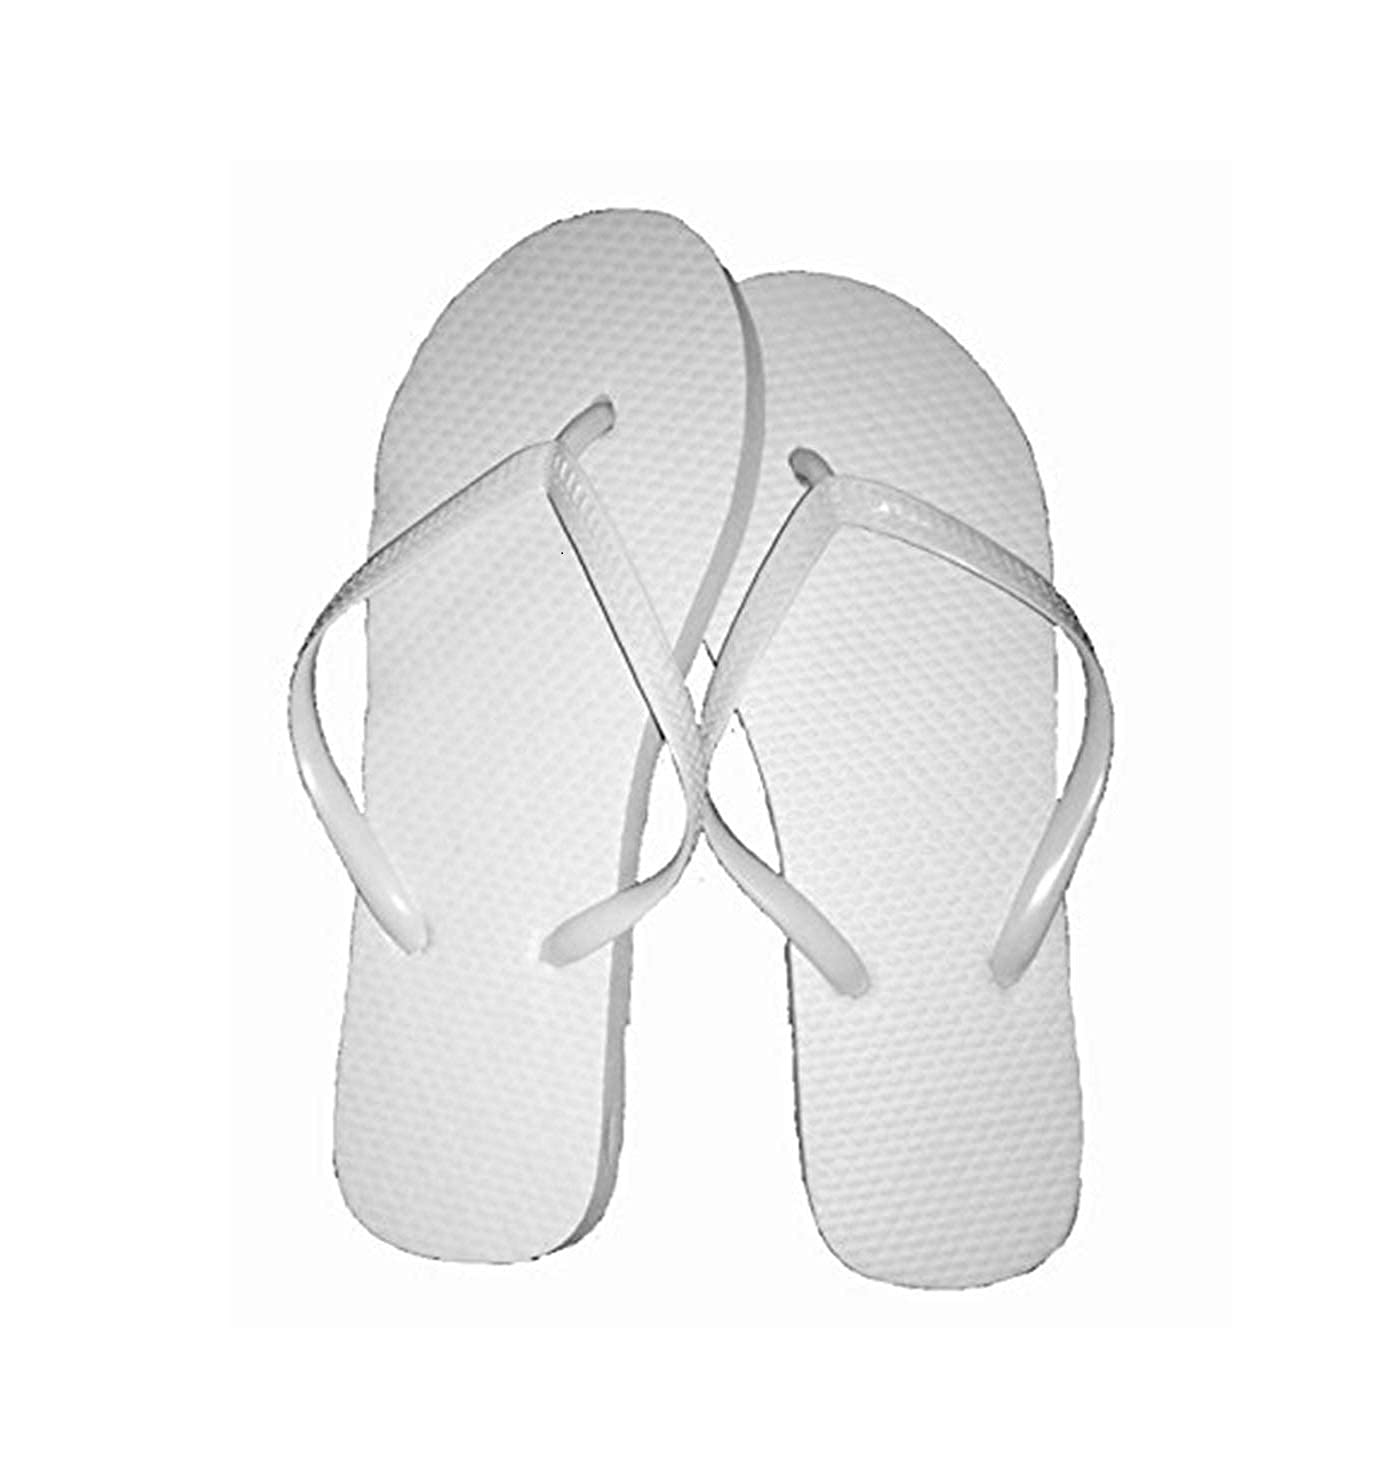 a7b75803e472a Wholesale Ladies 72 Pairs Solid White Flip Flops  Amazon.co.uk  Shoes   Bags